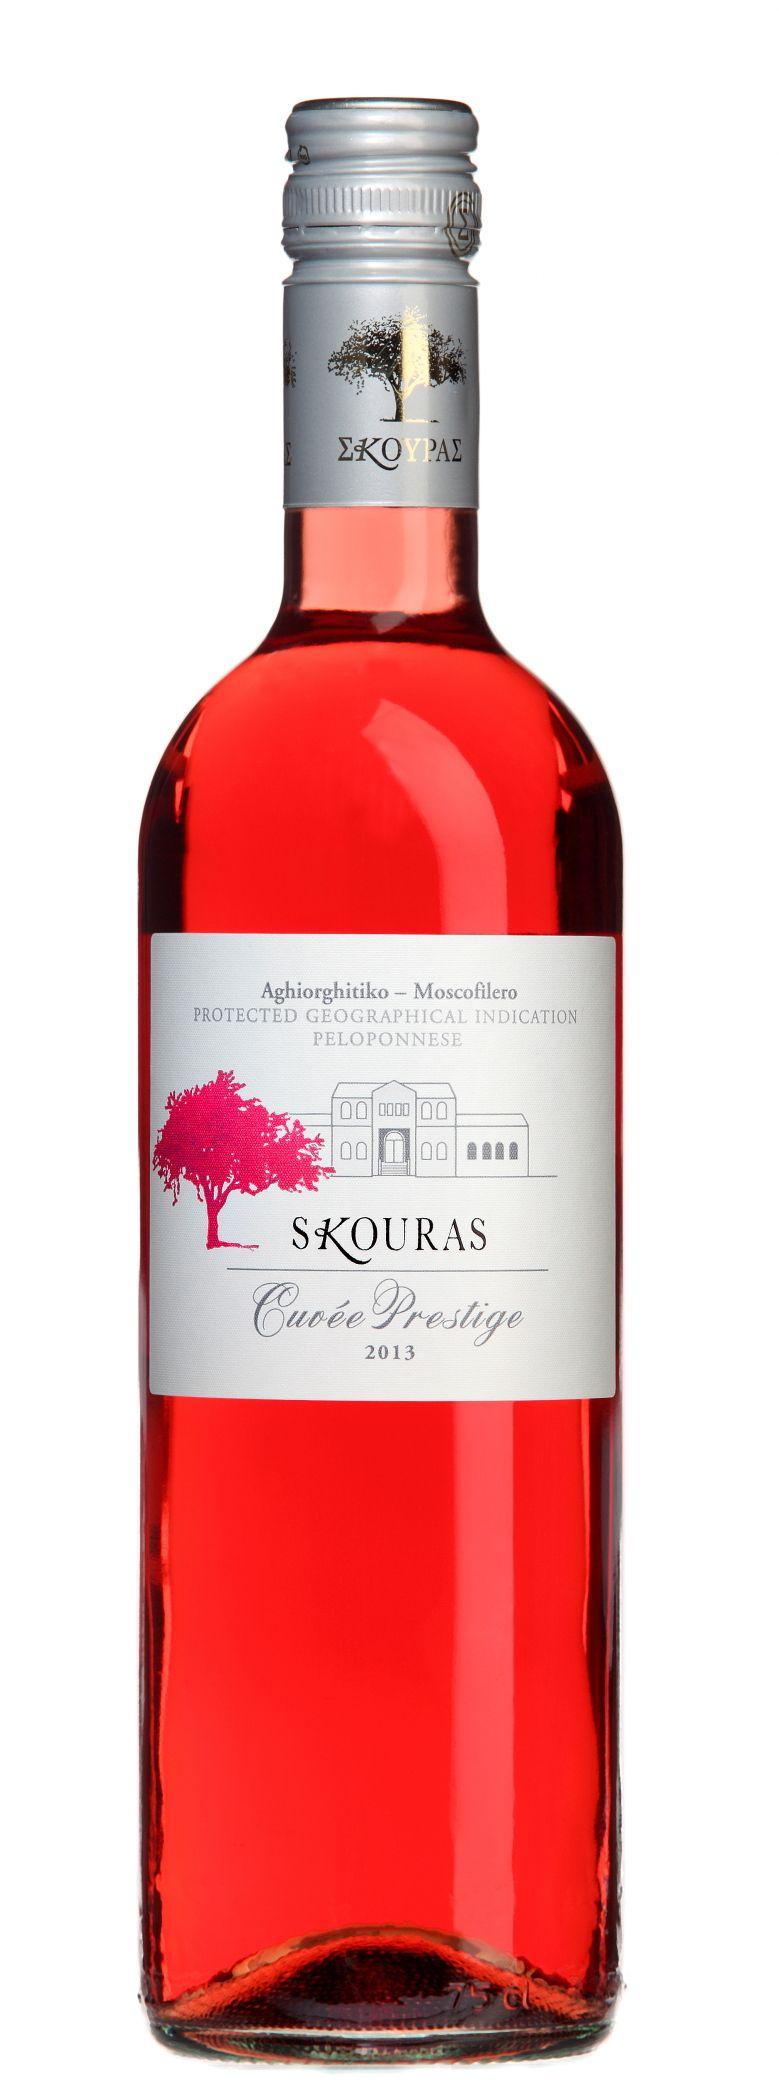 Cuvee Prestige Rose Aghiorghitiko 70 Moscofilero 30 Http Www Skouras Gr Wines Rose Cuvee Prestige Rose Greek Wine Rose Wine Wine